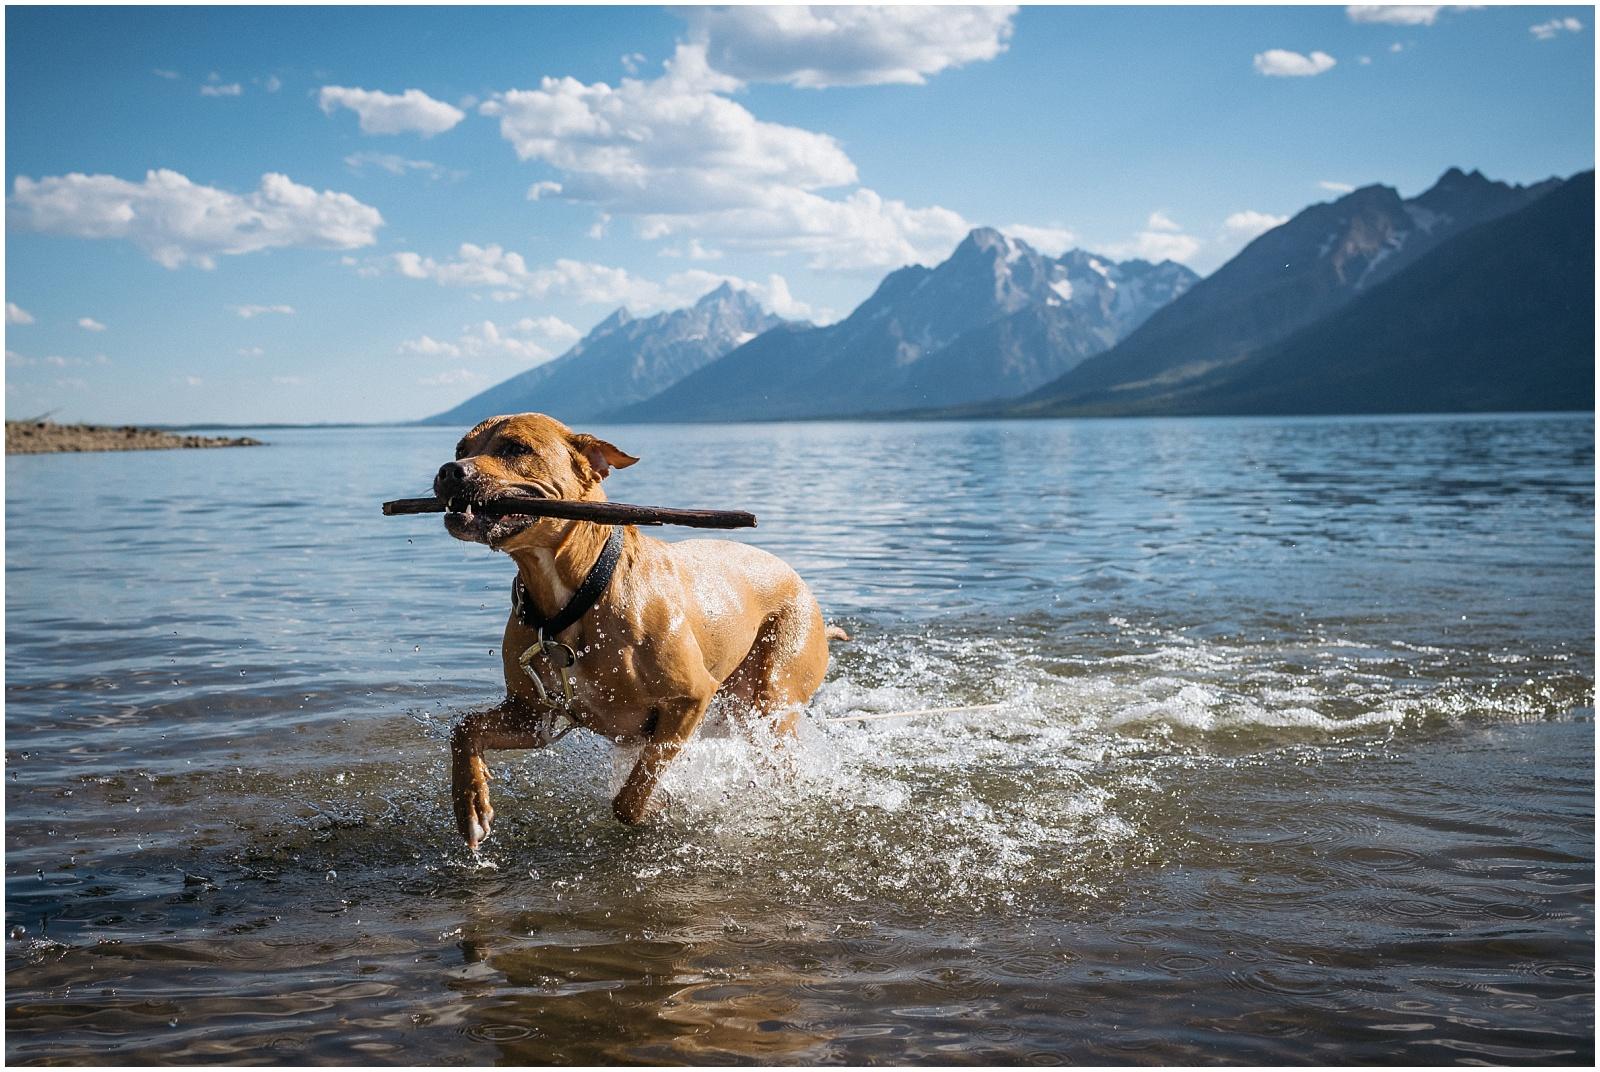 Happy Dog fetching stick in lake at Grand Teton National Park